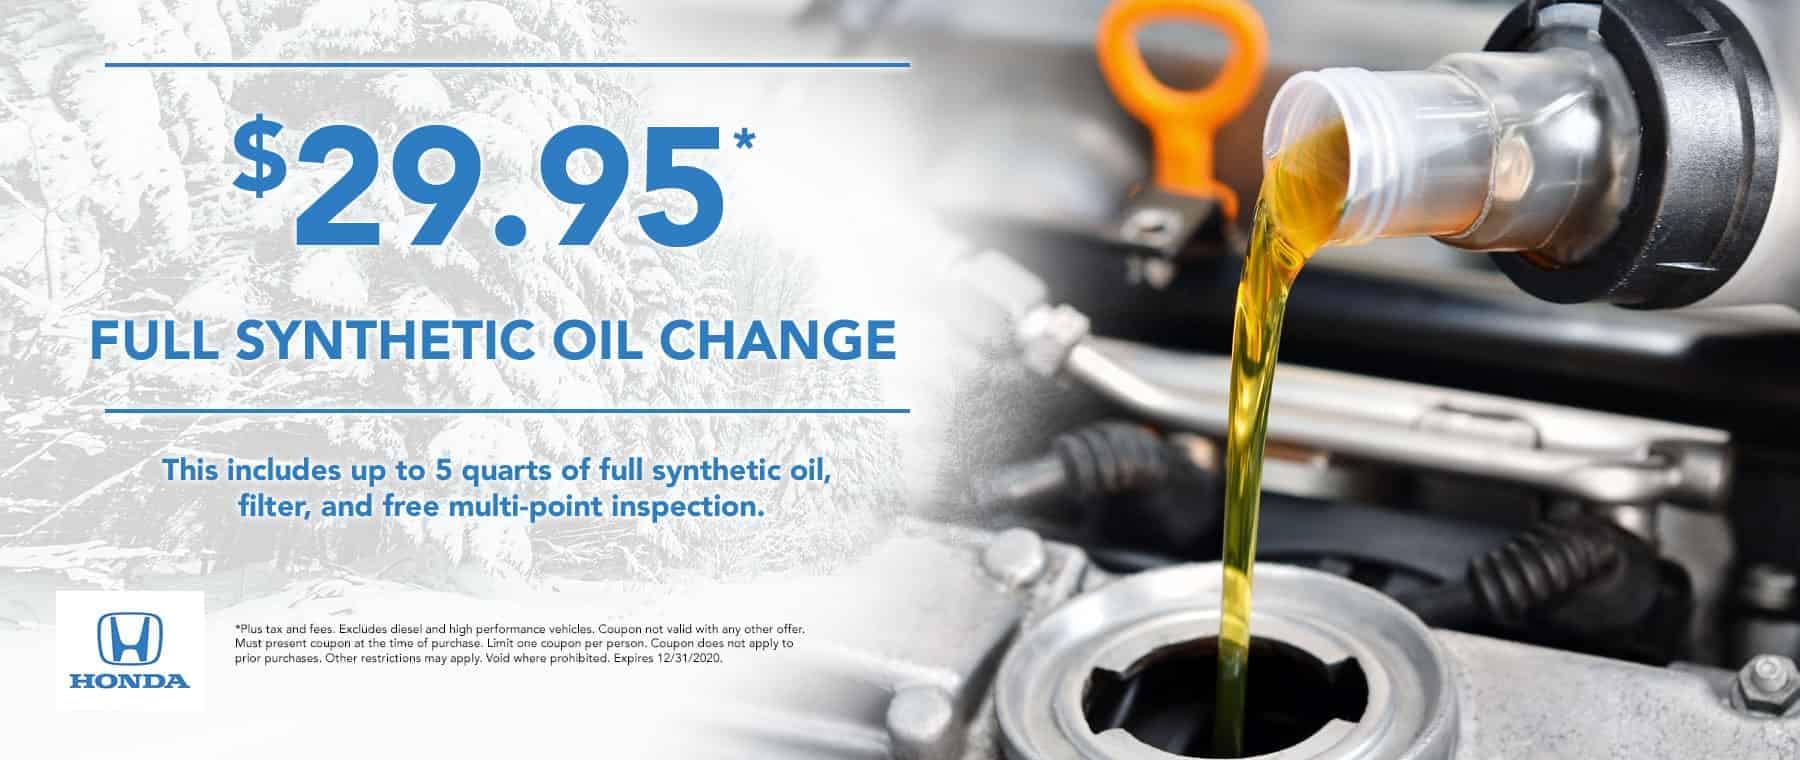 $29.95 oil change